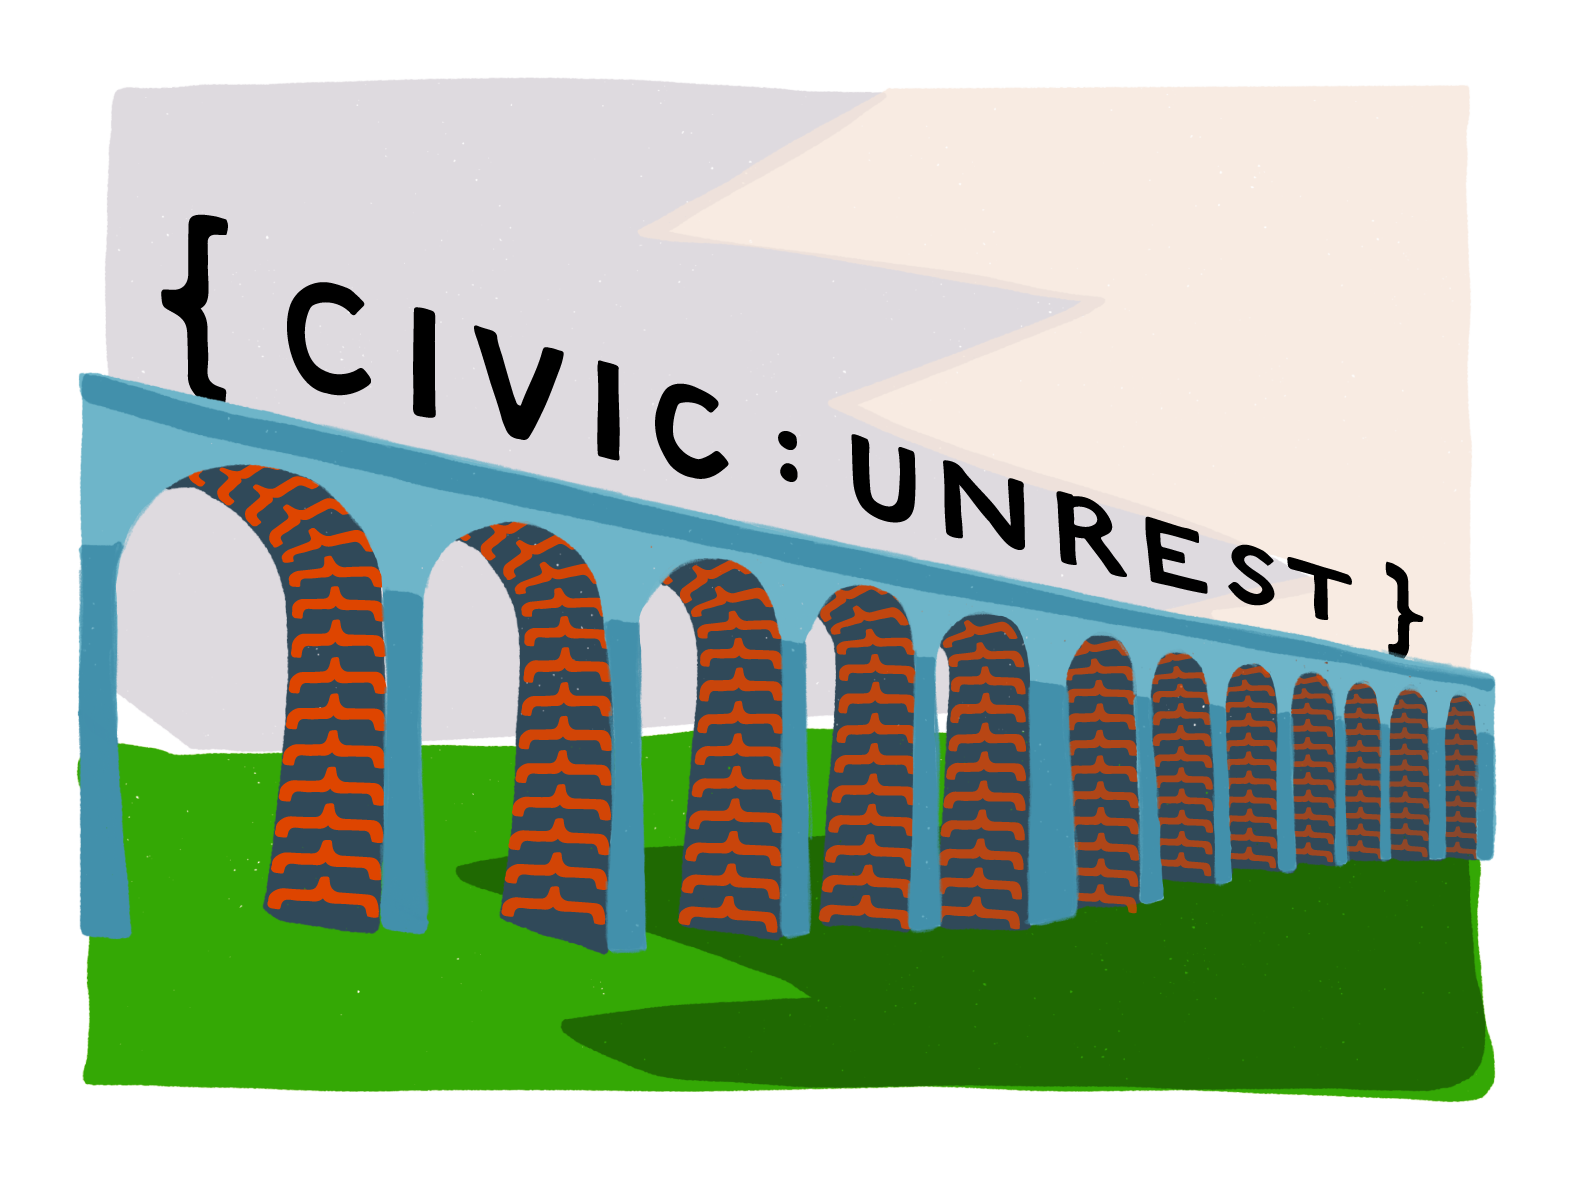 Civic Unrest – Civic Unrest